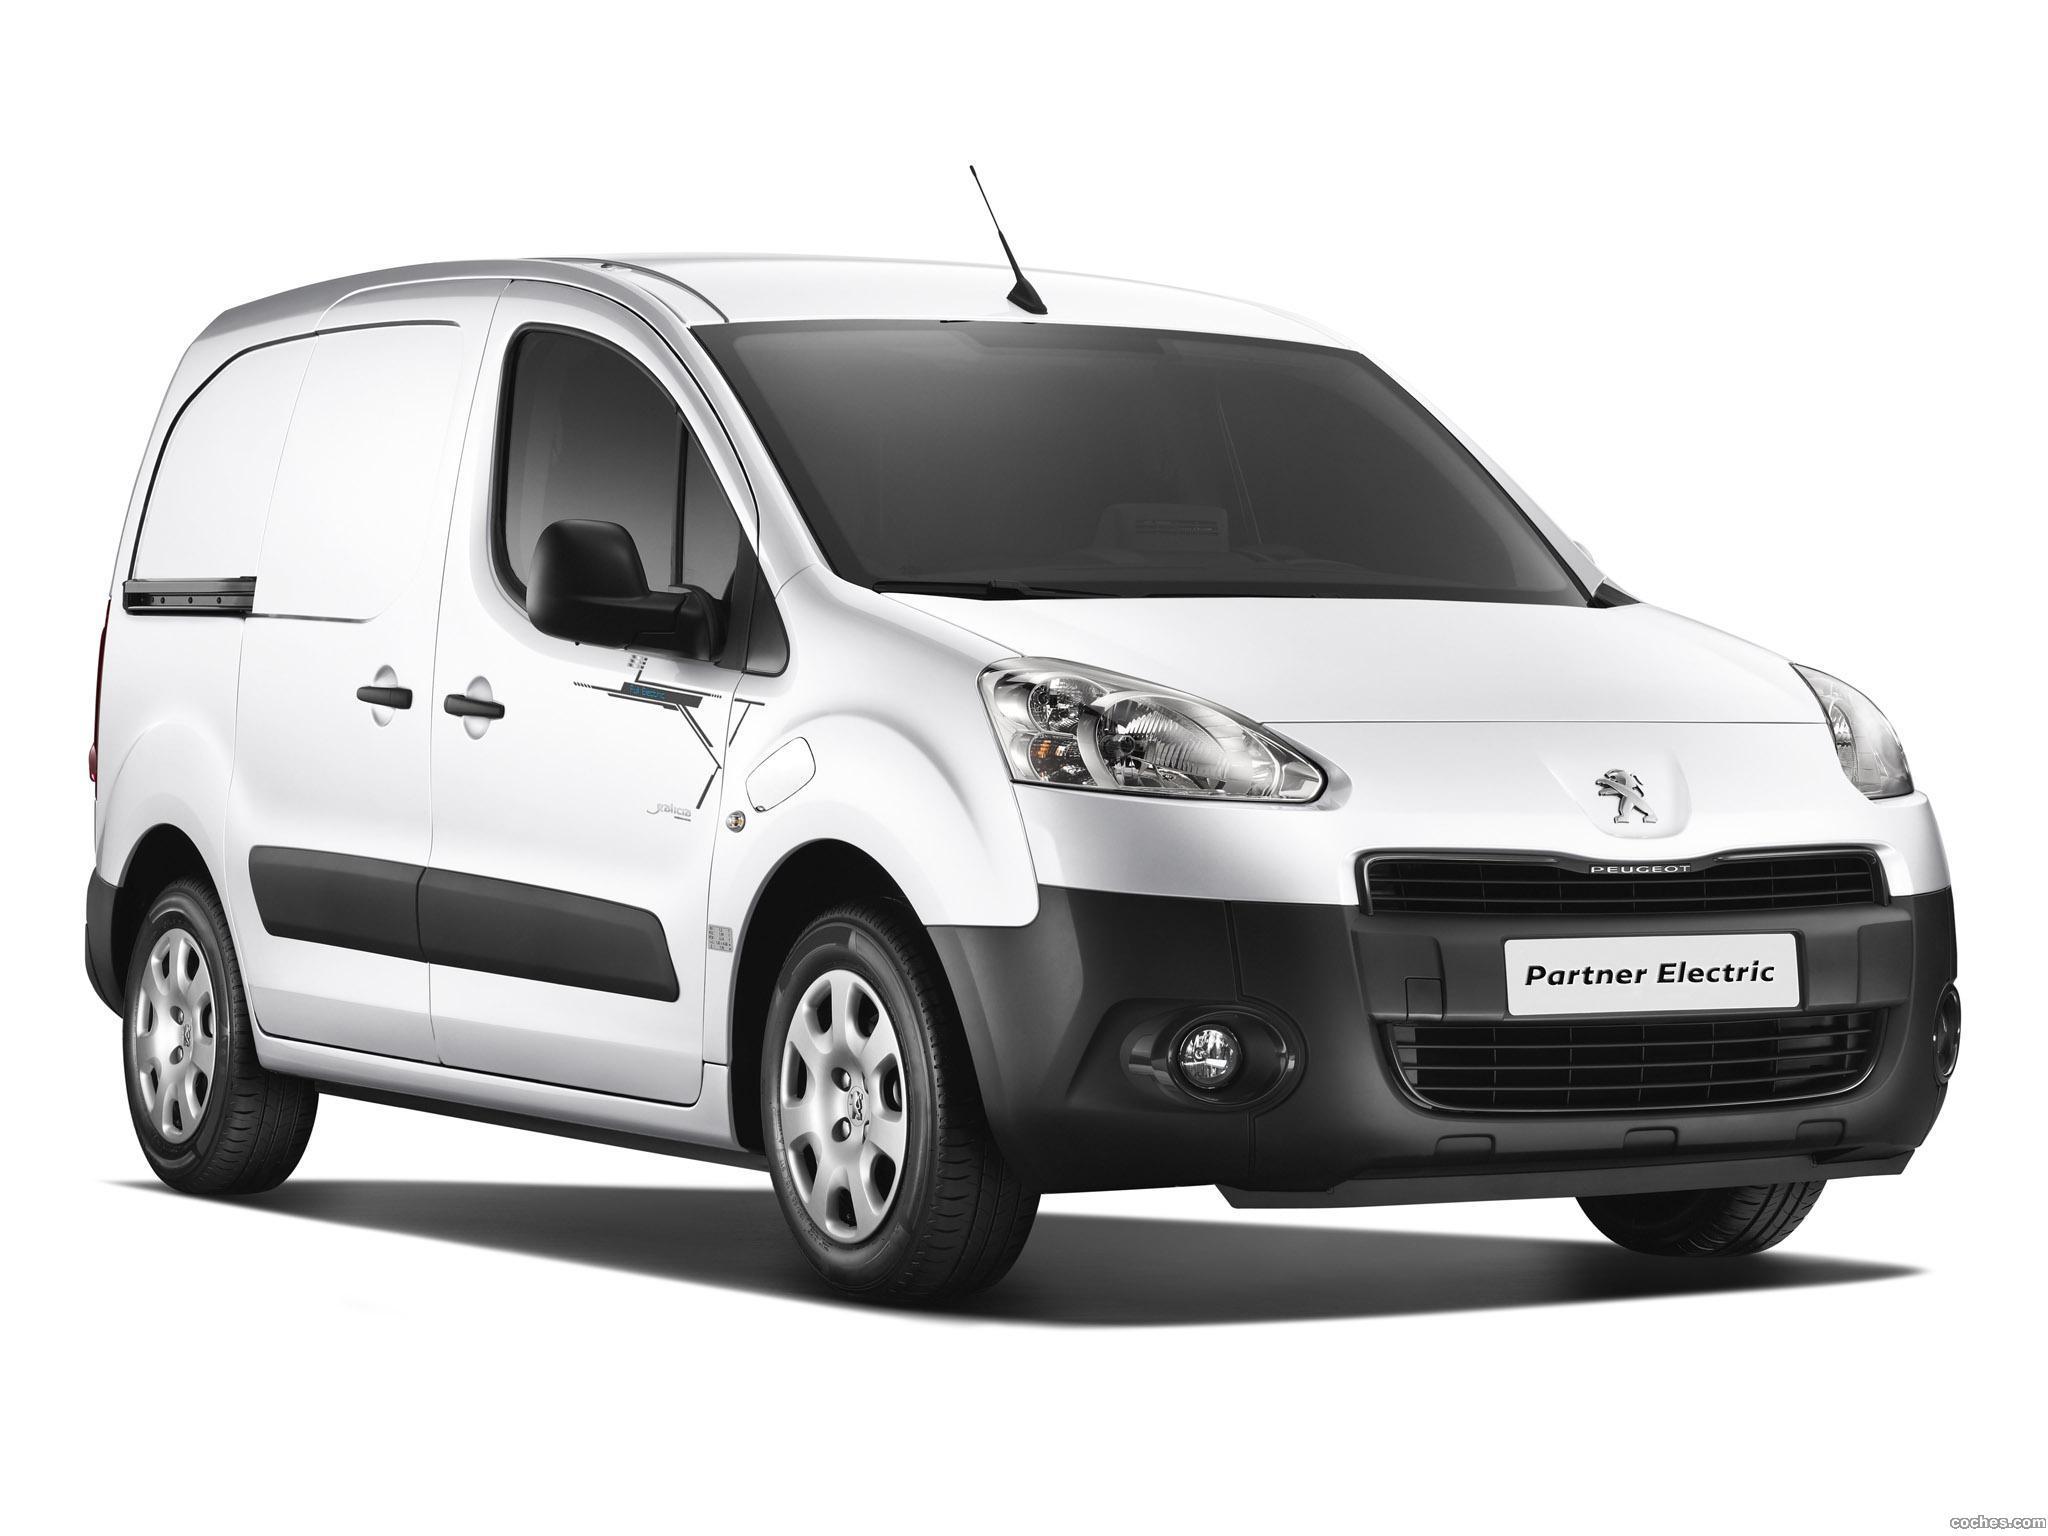 Foto 0 de Peugeot Partner Electric 2013